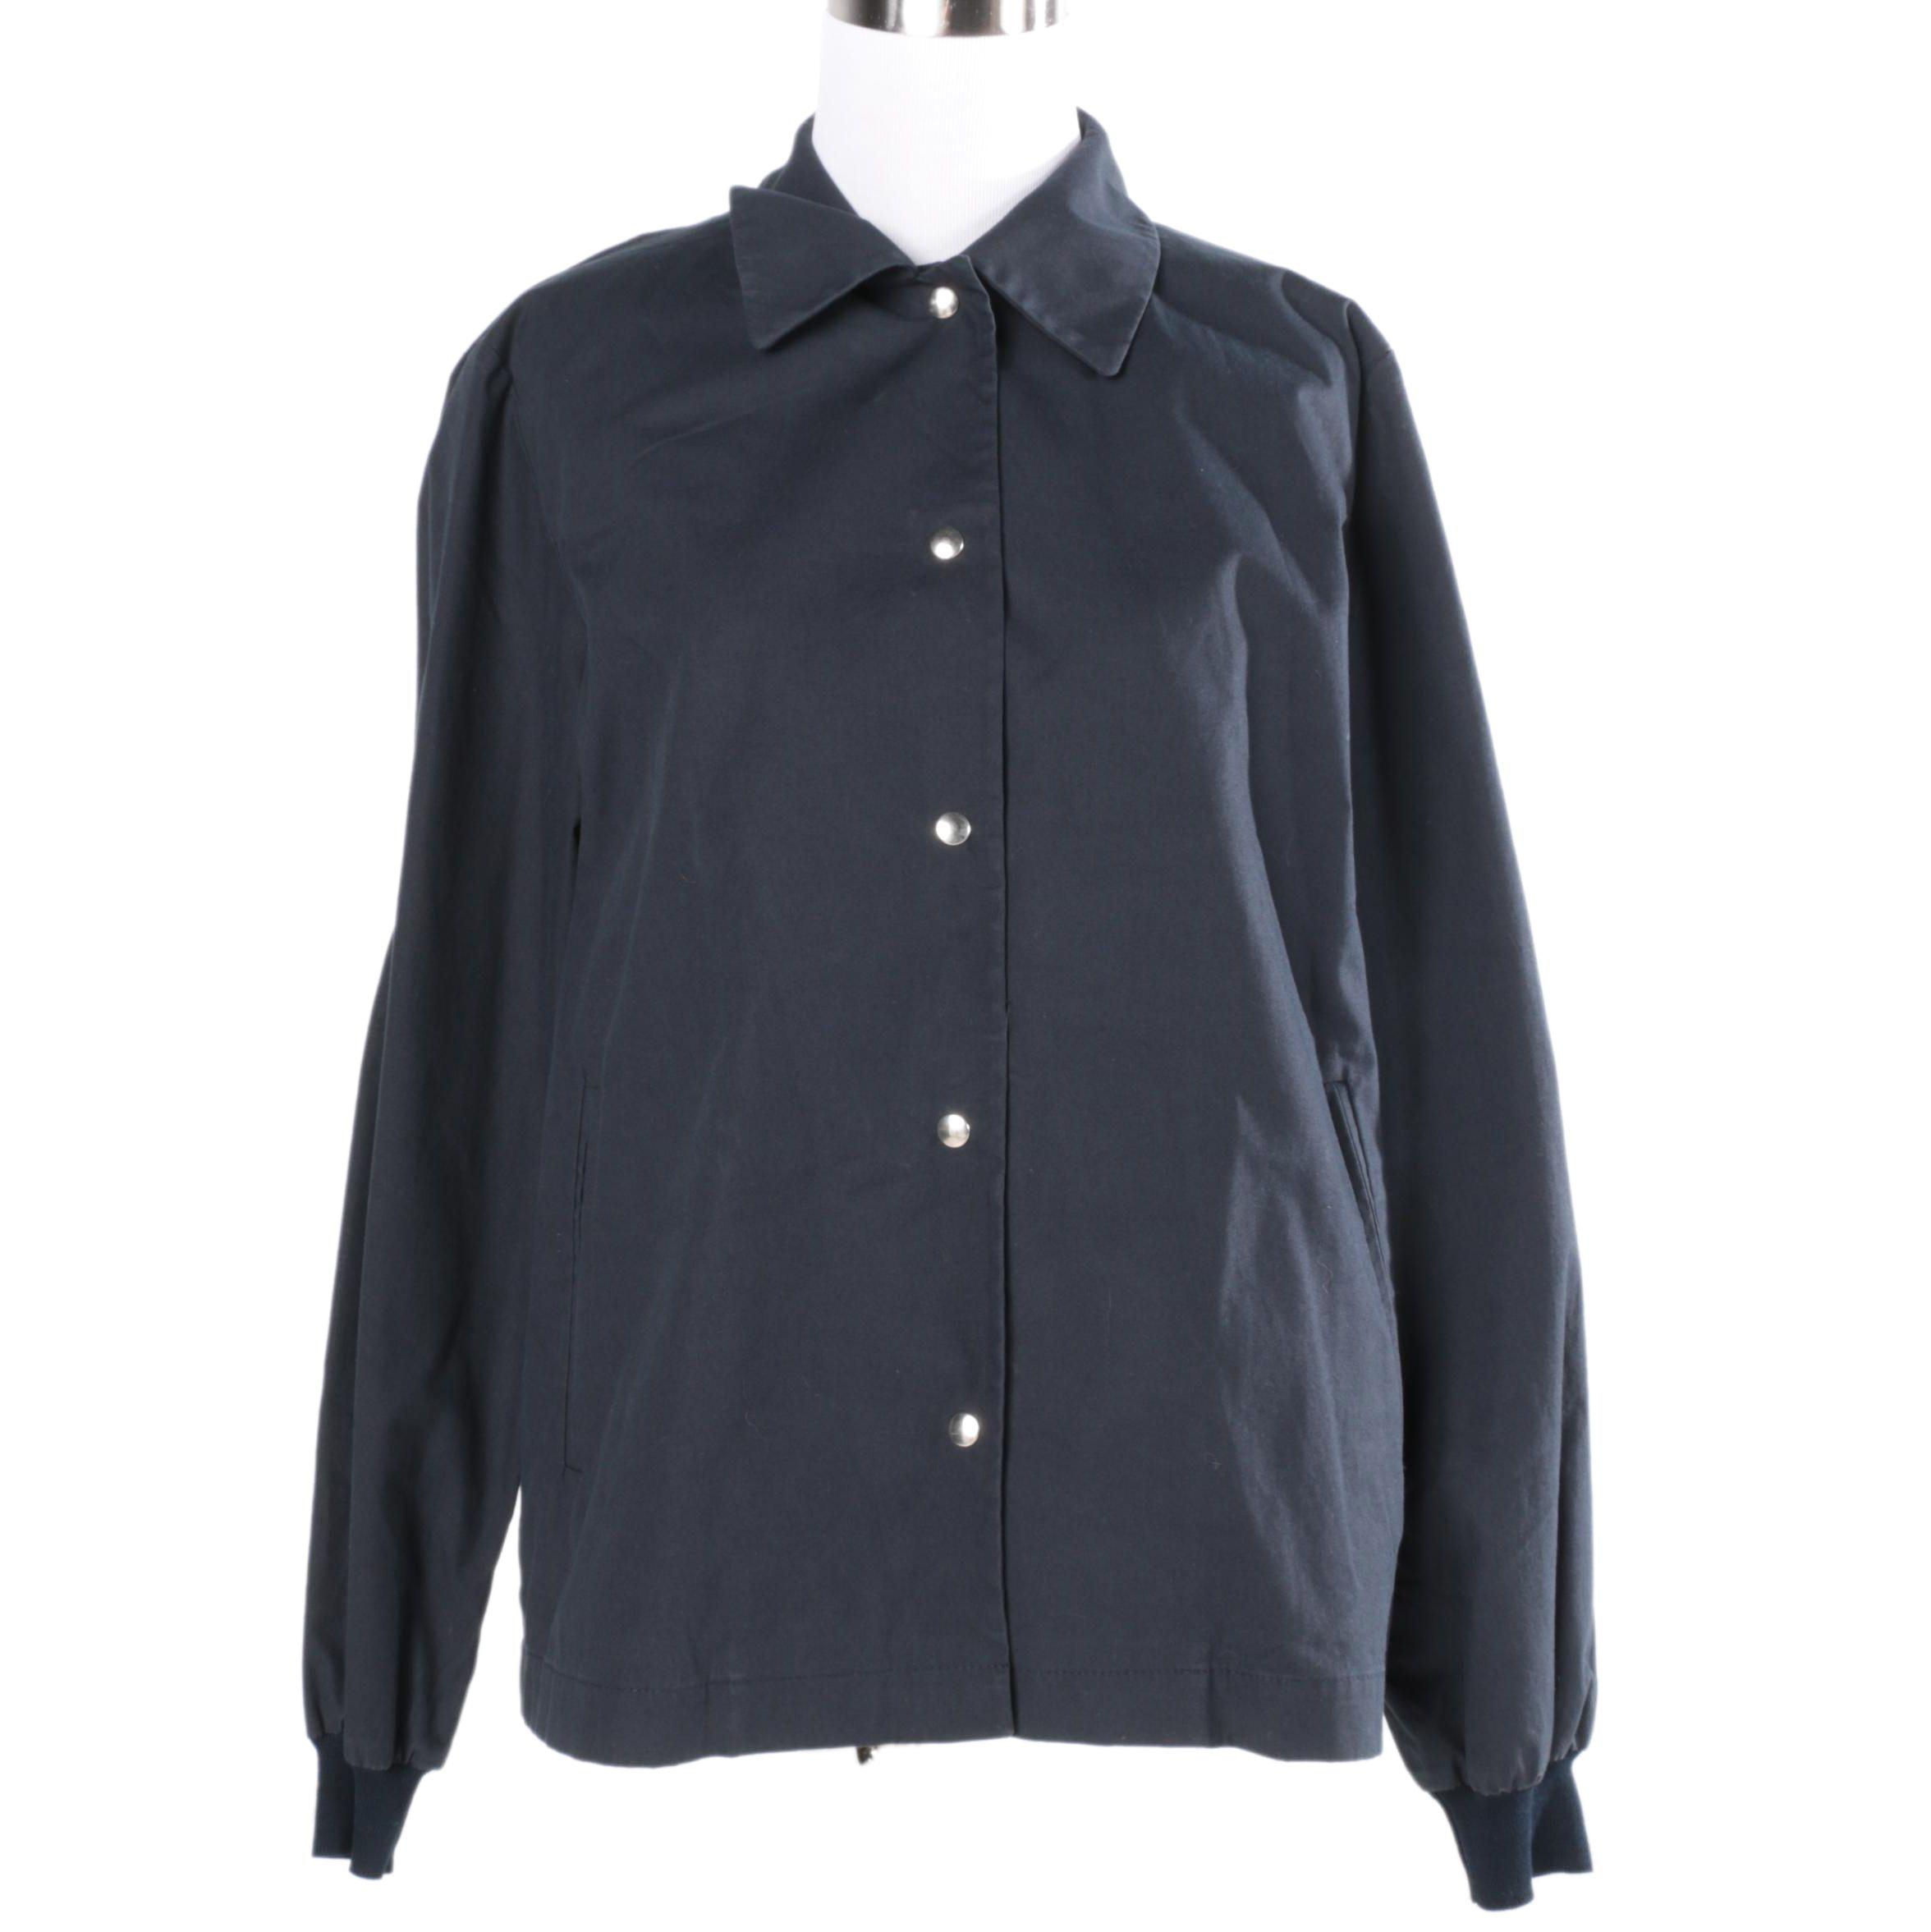 Kors By Michael Kors Women's Jacket